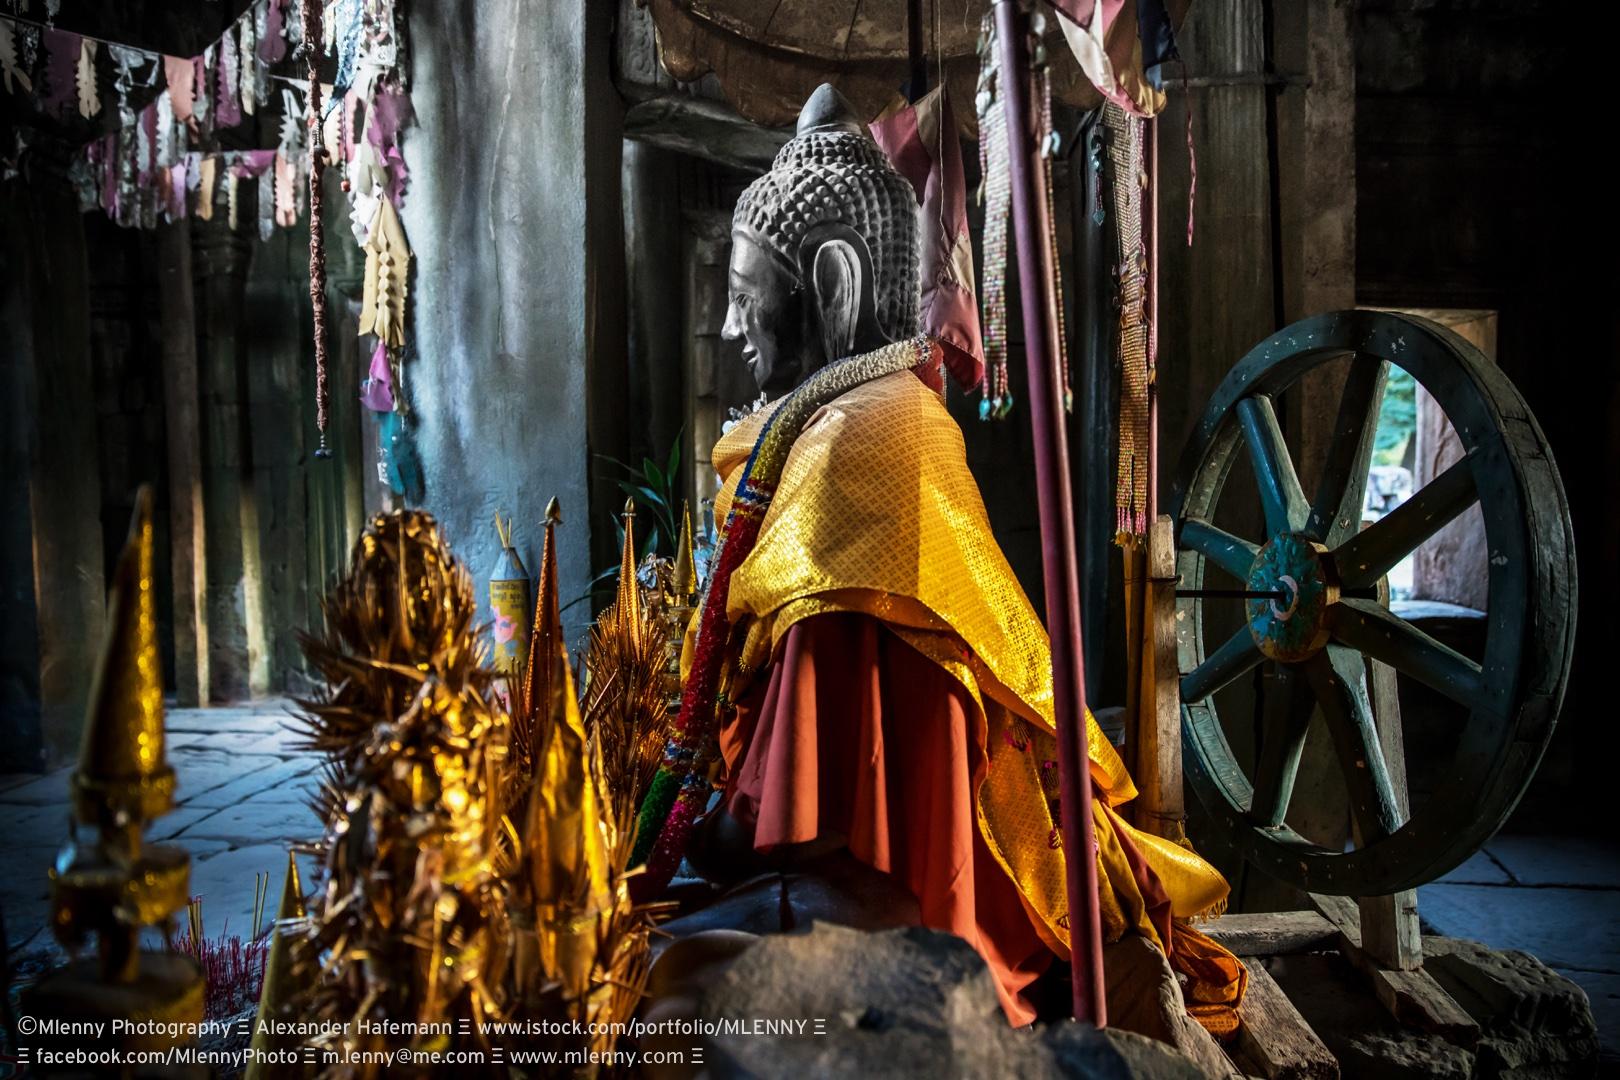 metropolis buddhist single men Metro manila (filipino: kalakhang  (eg christian mausoleums sitting next to buddhist ones at the  siga, may find strangers their enemies, beside others men in.